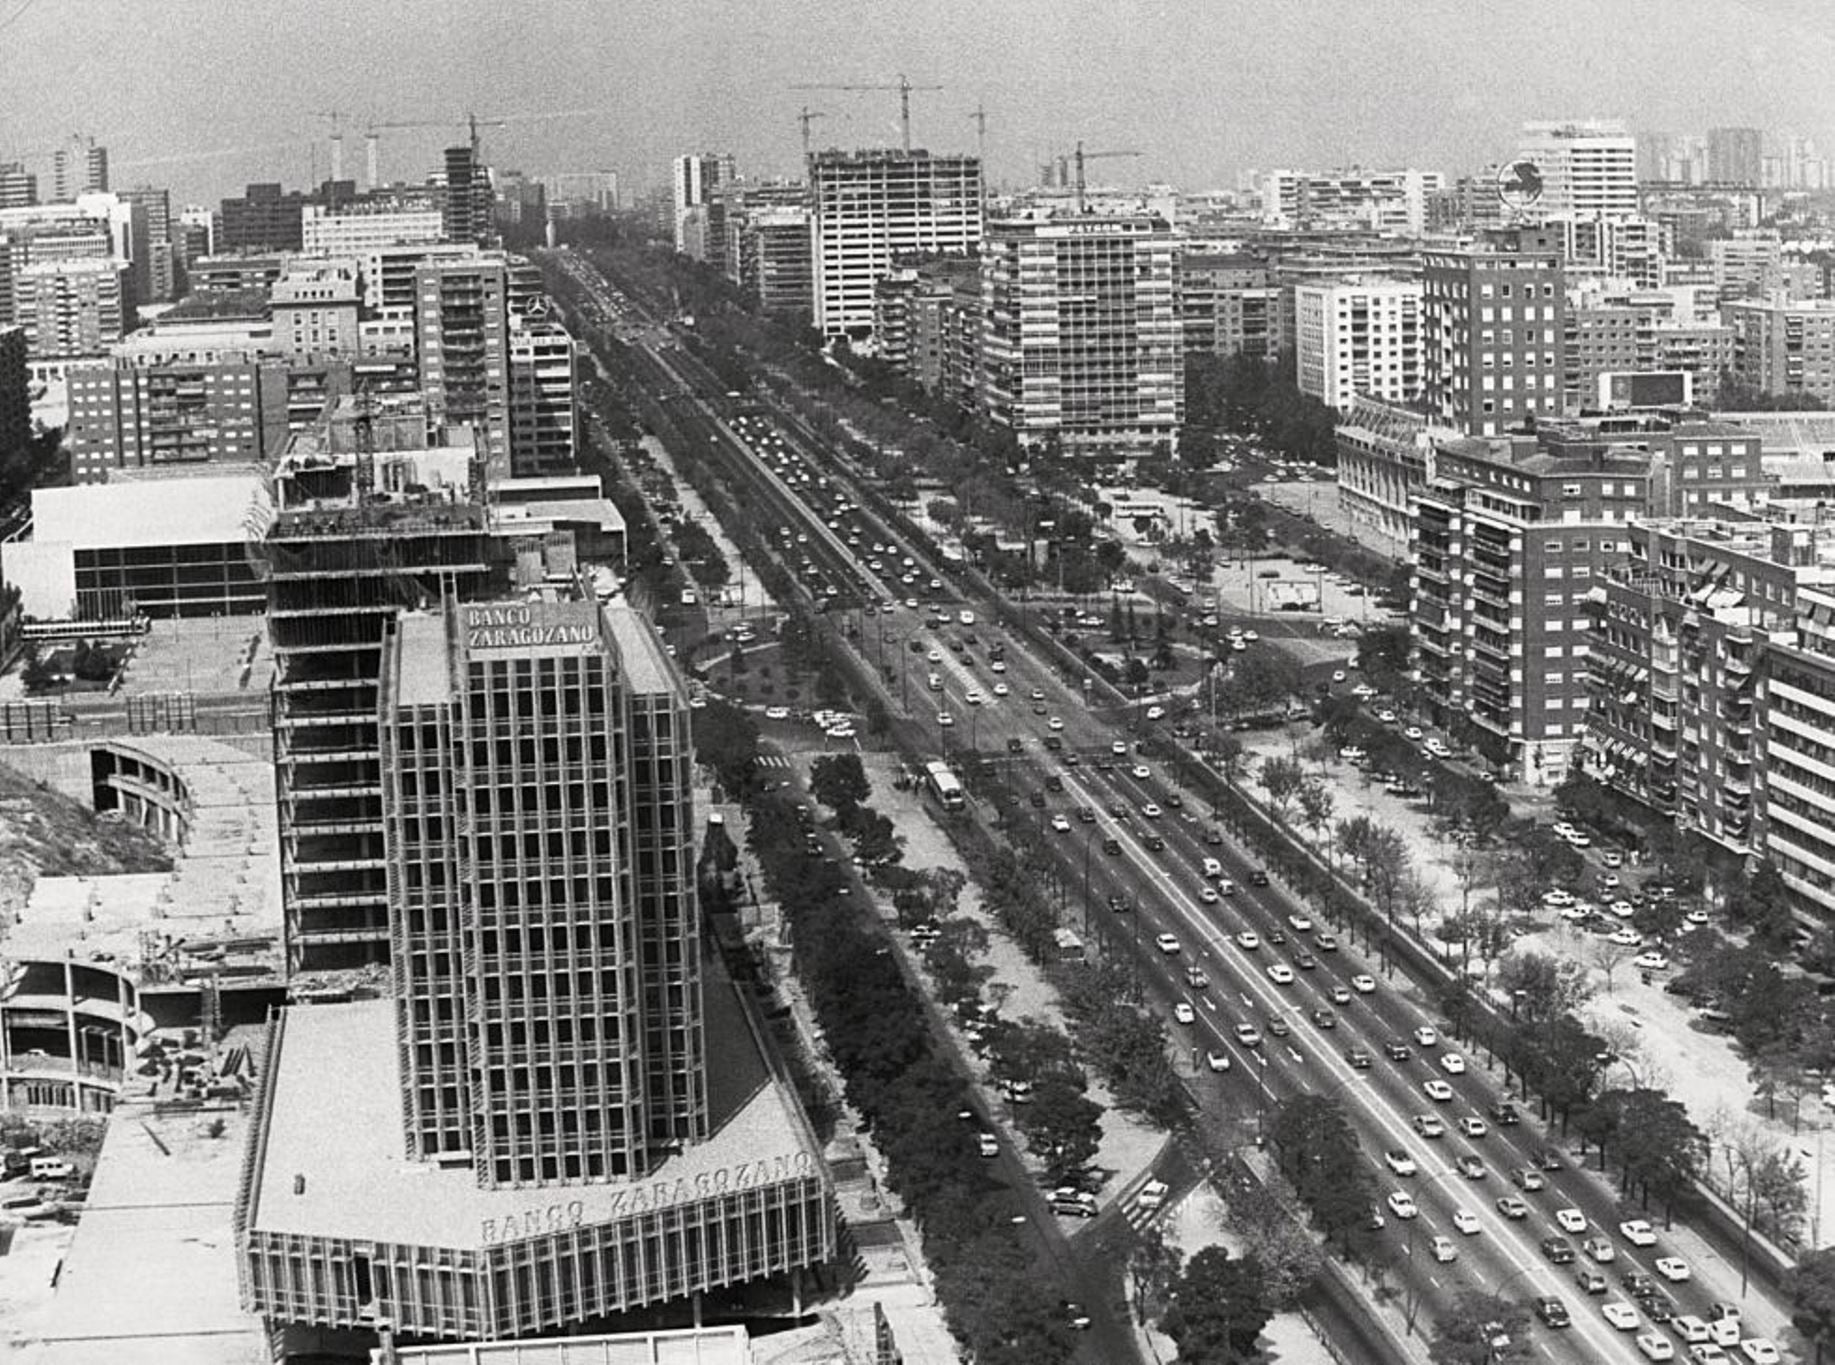 Paseo de la Castellana 1977